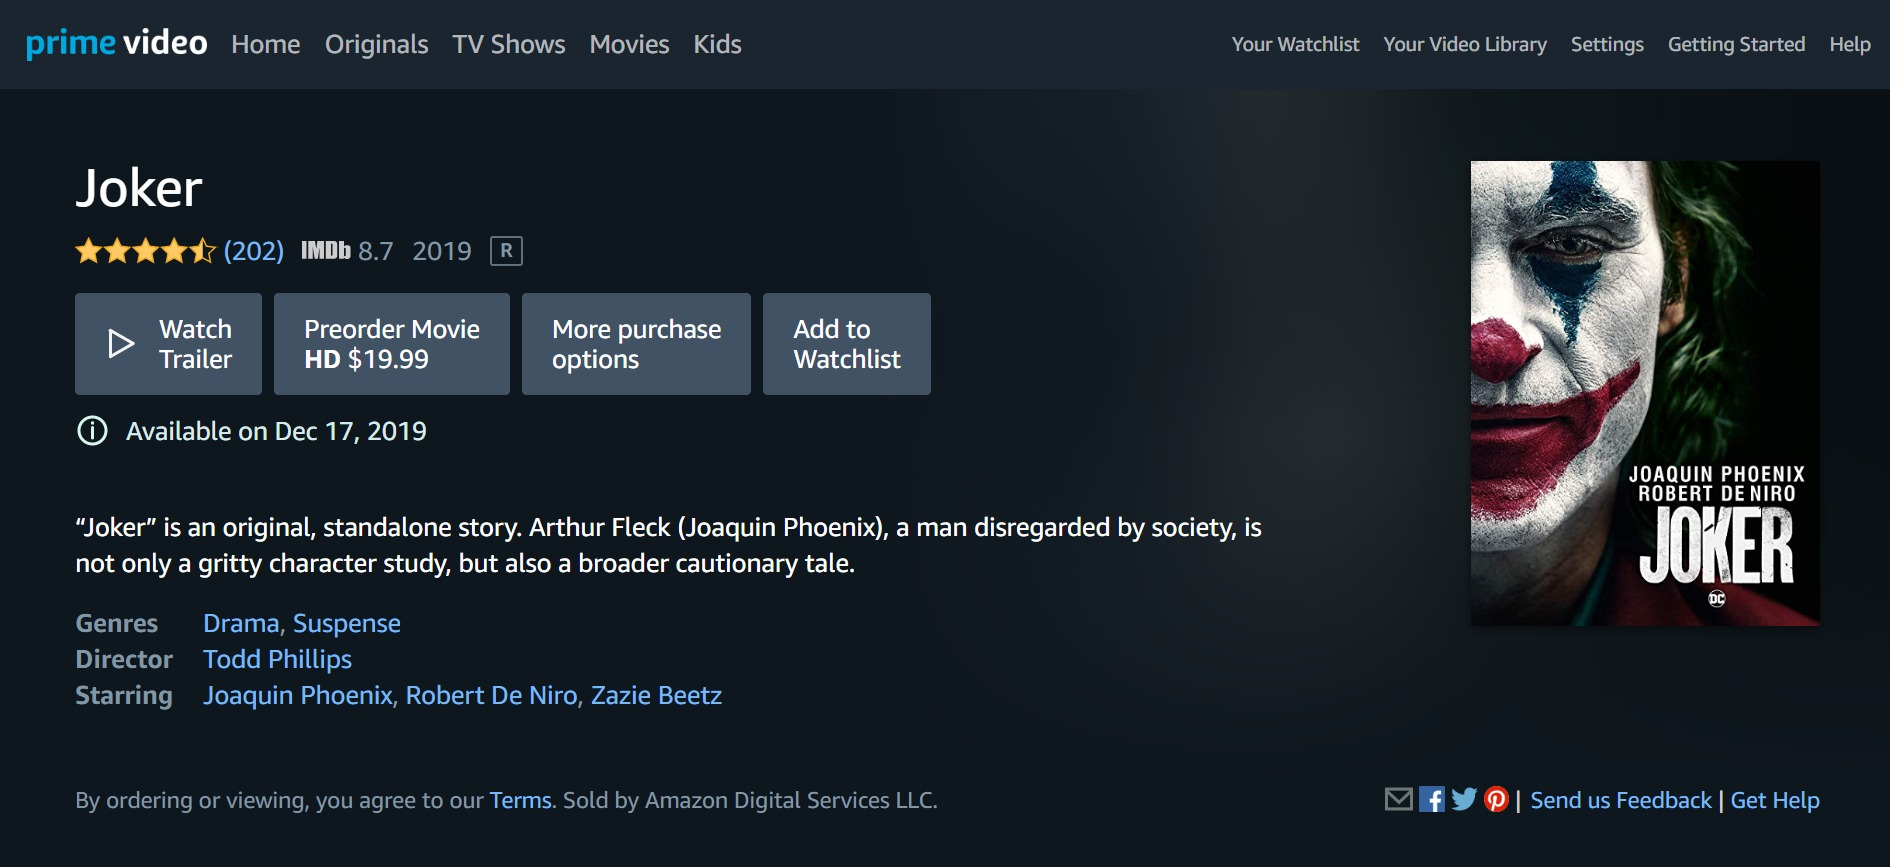 Joker Digital HD Listing